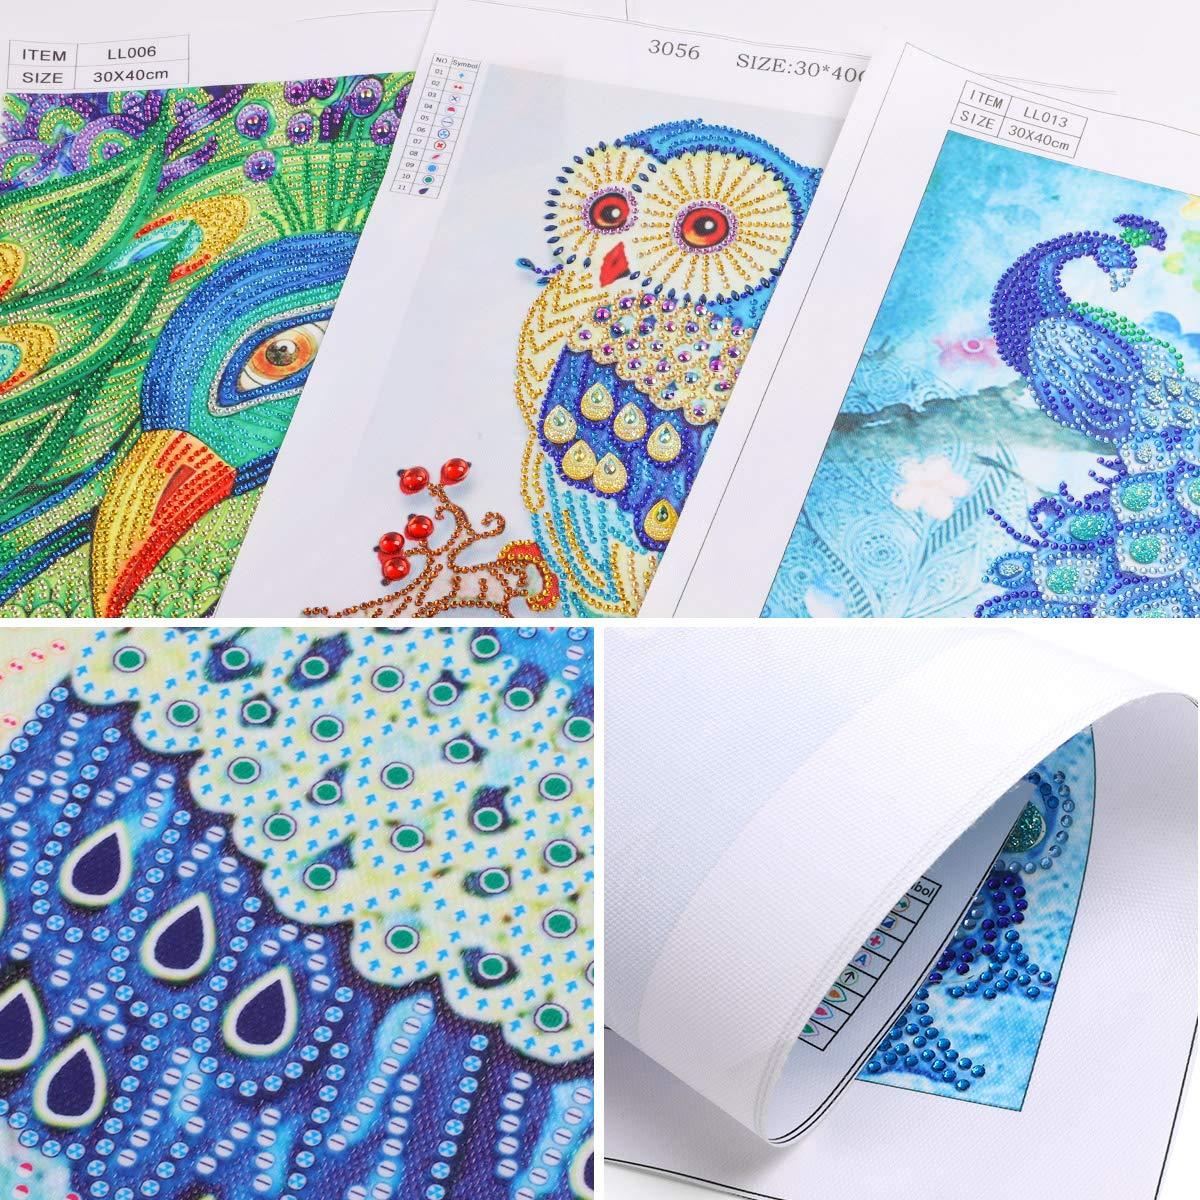 MXJSUA DIY 5D Diamond Painting Kit de Taladro Redondo Completo Rhinestone Picture Art Craft para la decoraci/ón de la Pared del hogar 30x40 cm Dinosaurio Junto al Lago